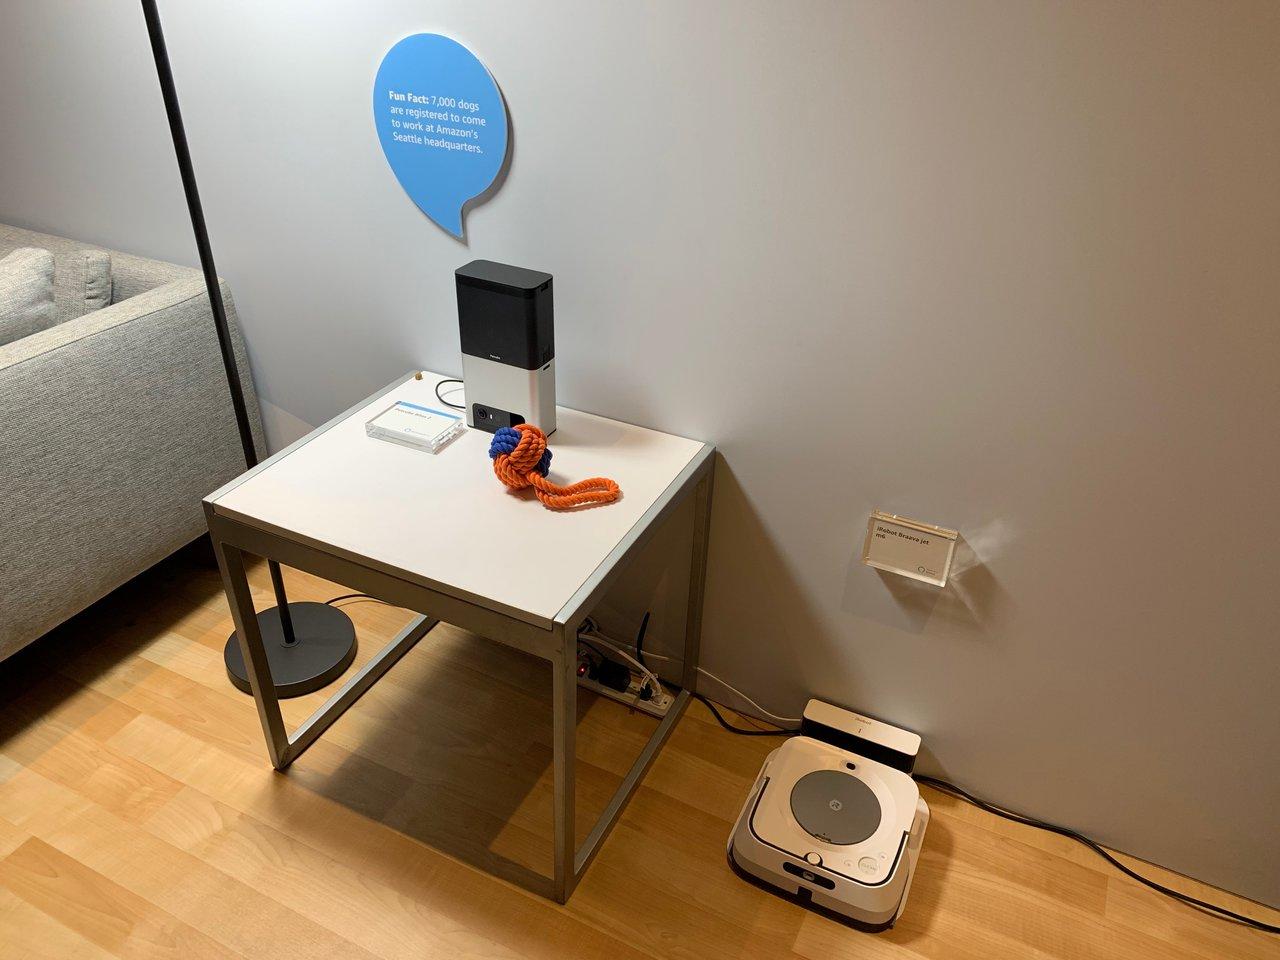 Amazonブース内で展示されたAmazonアレクサに連動する家電